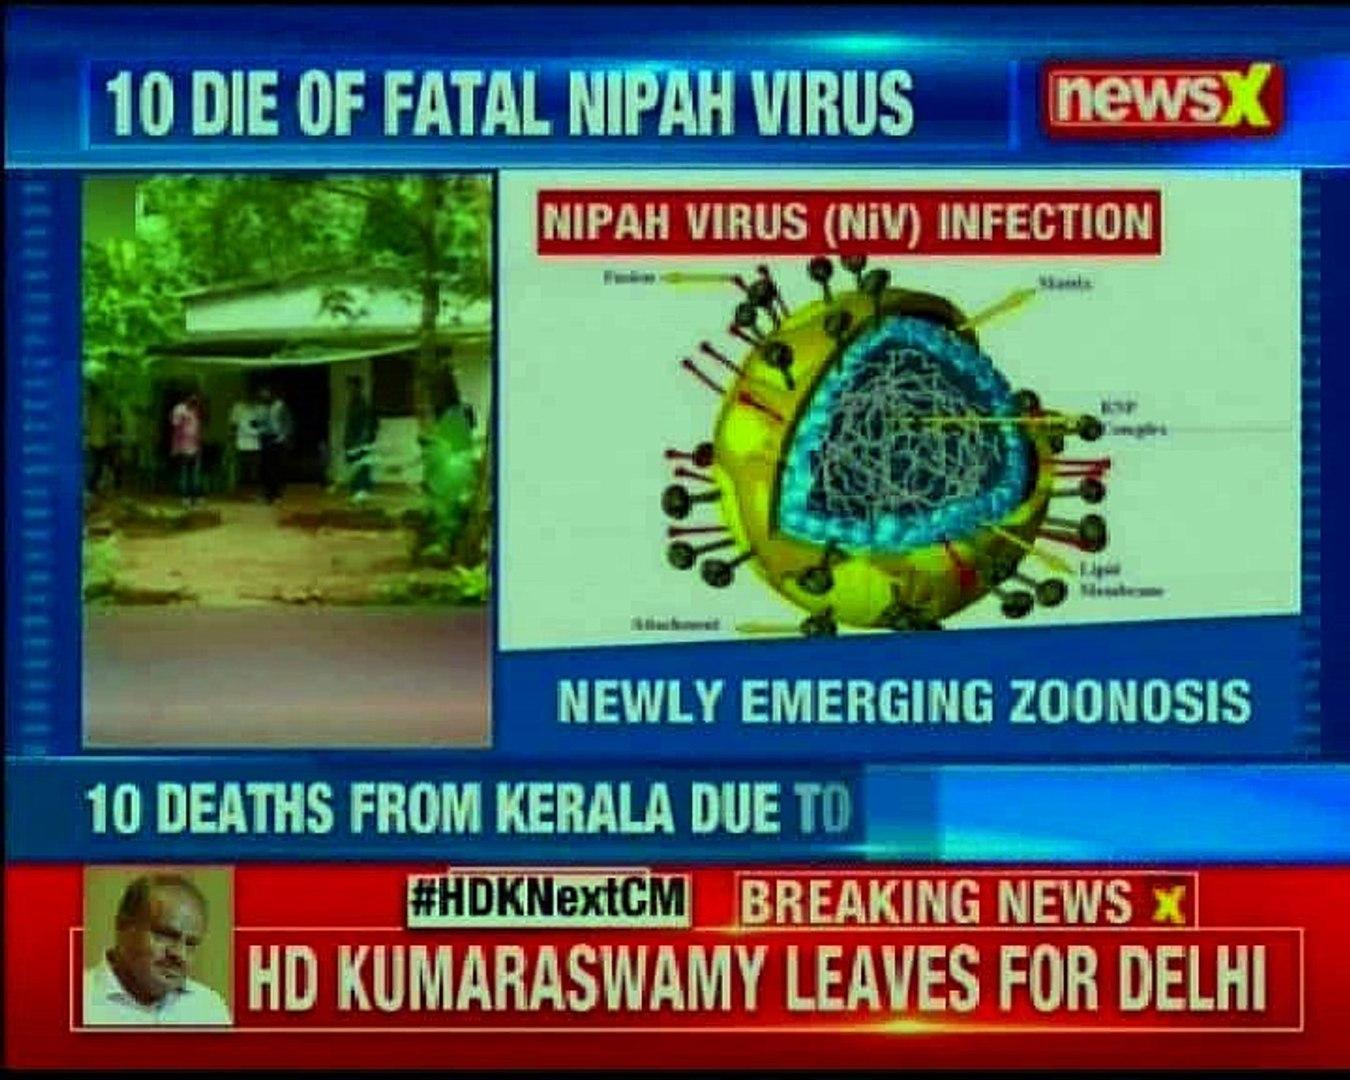 Nipah virus outbreak: Rare and deadly virus scare; 10 die of fatal Nipah virus